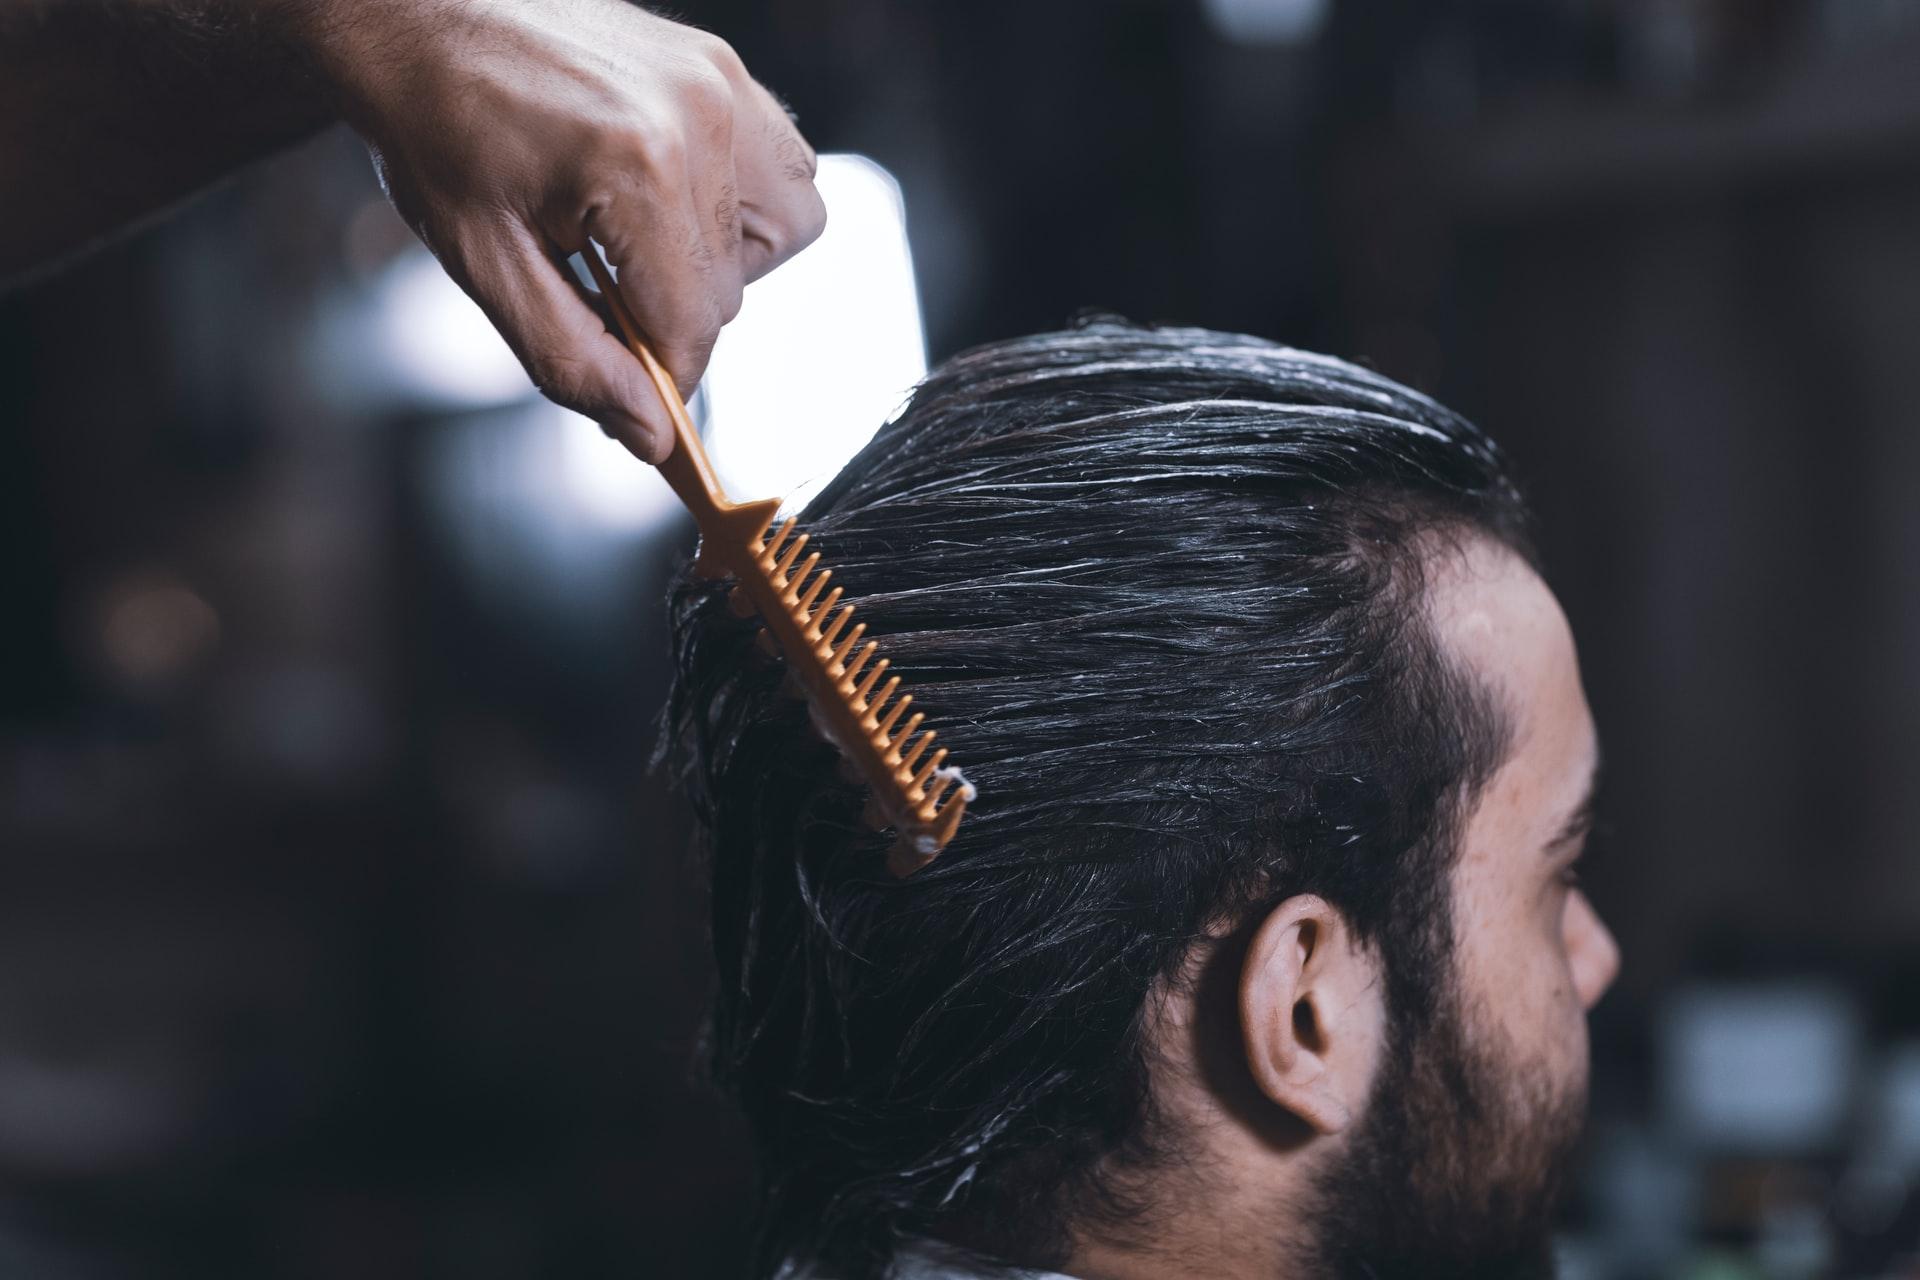 8 Produk Terbaik Bagi Mengatasi Masalah Rambut Gugur Bagi Lelaki